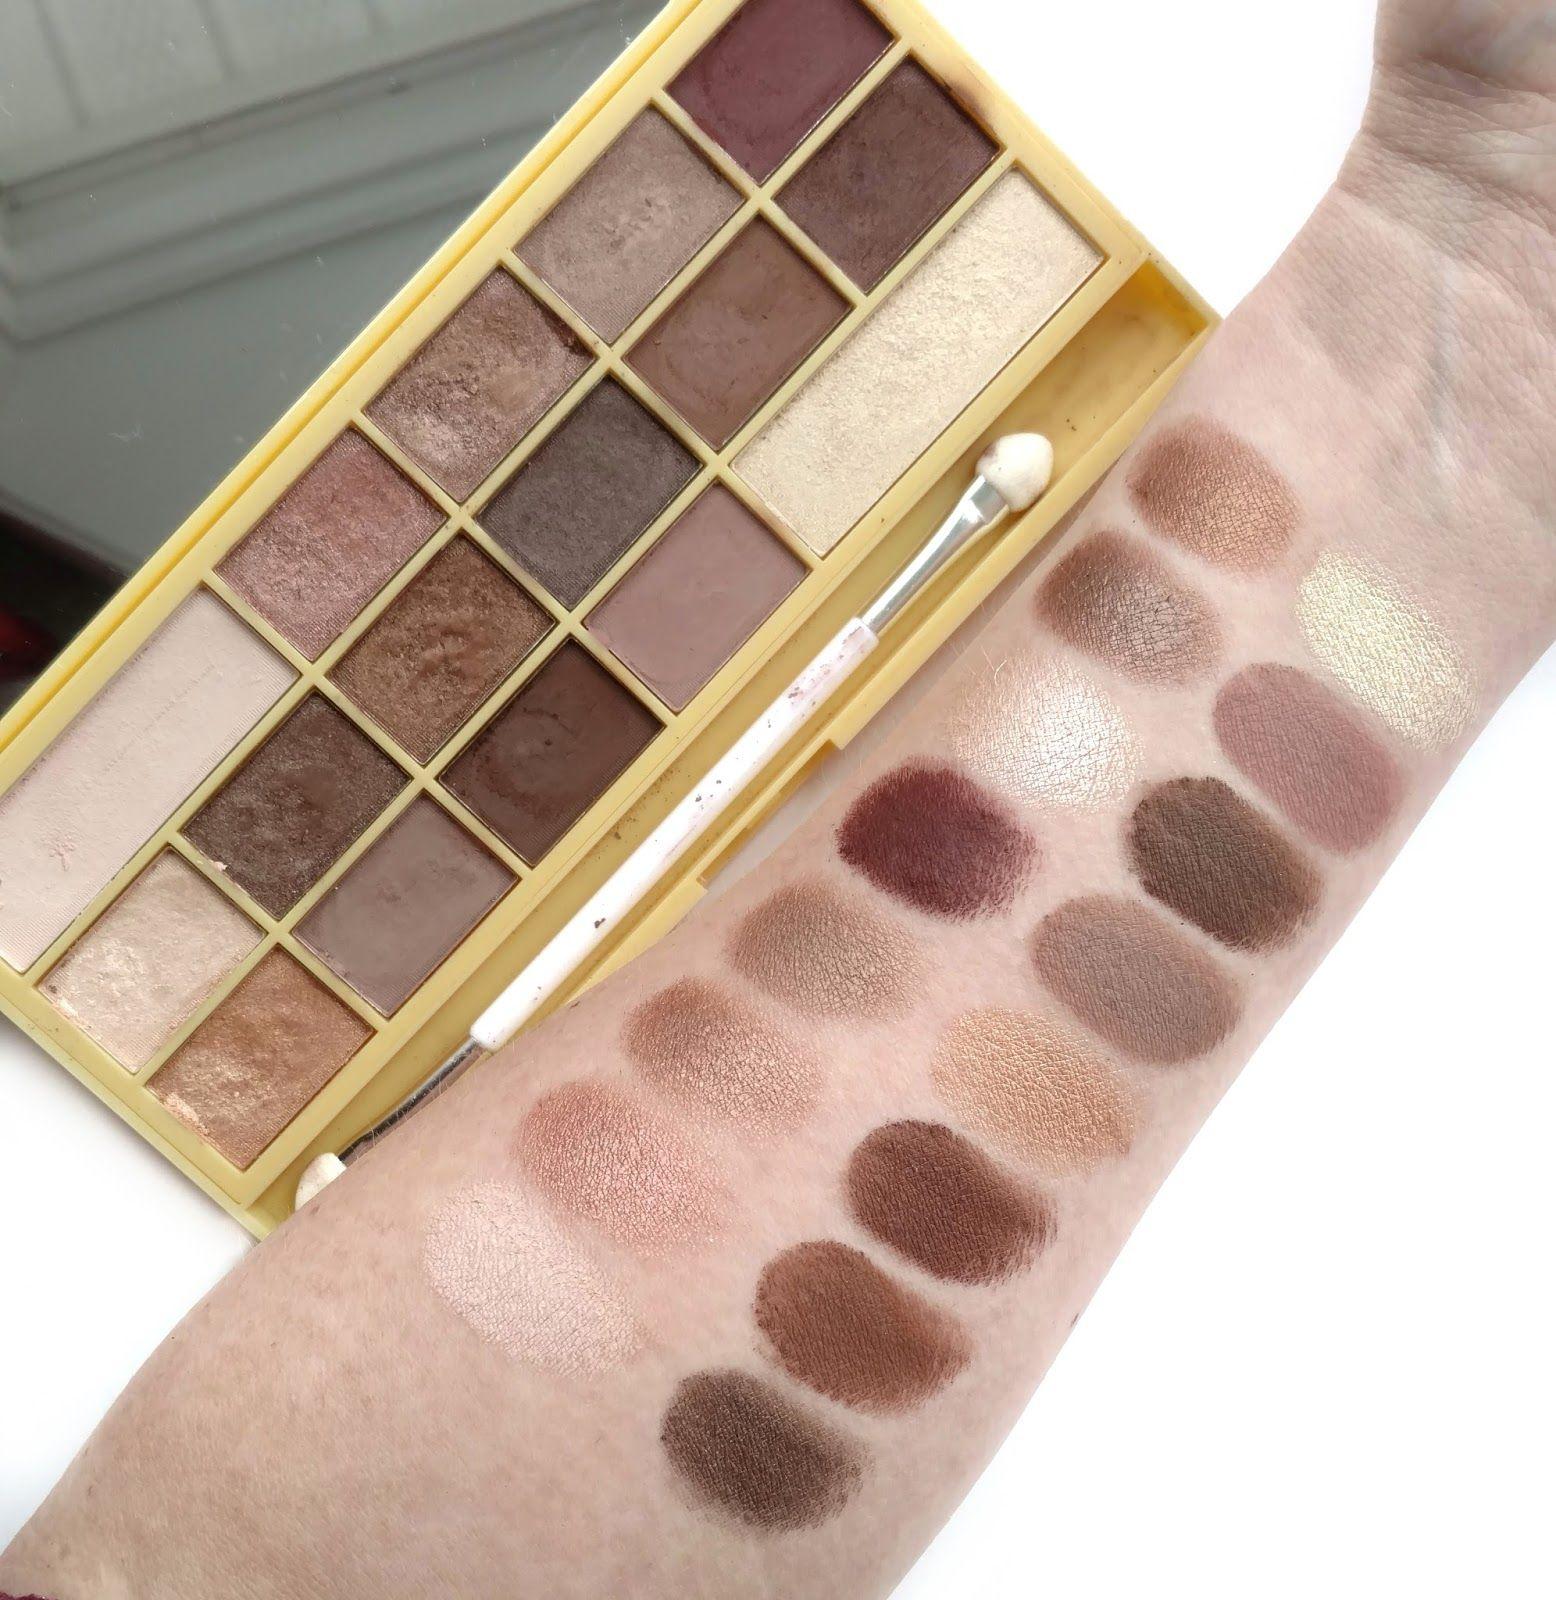 Oryginał Makeup Revolution Naked Chocolate swatches | Eyeshadow swatches in EK08